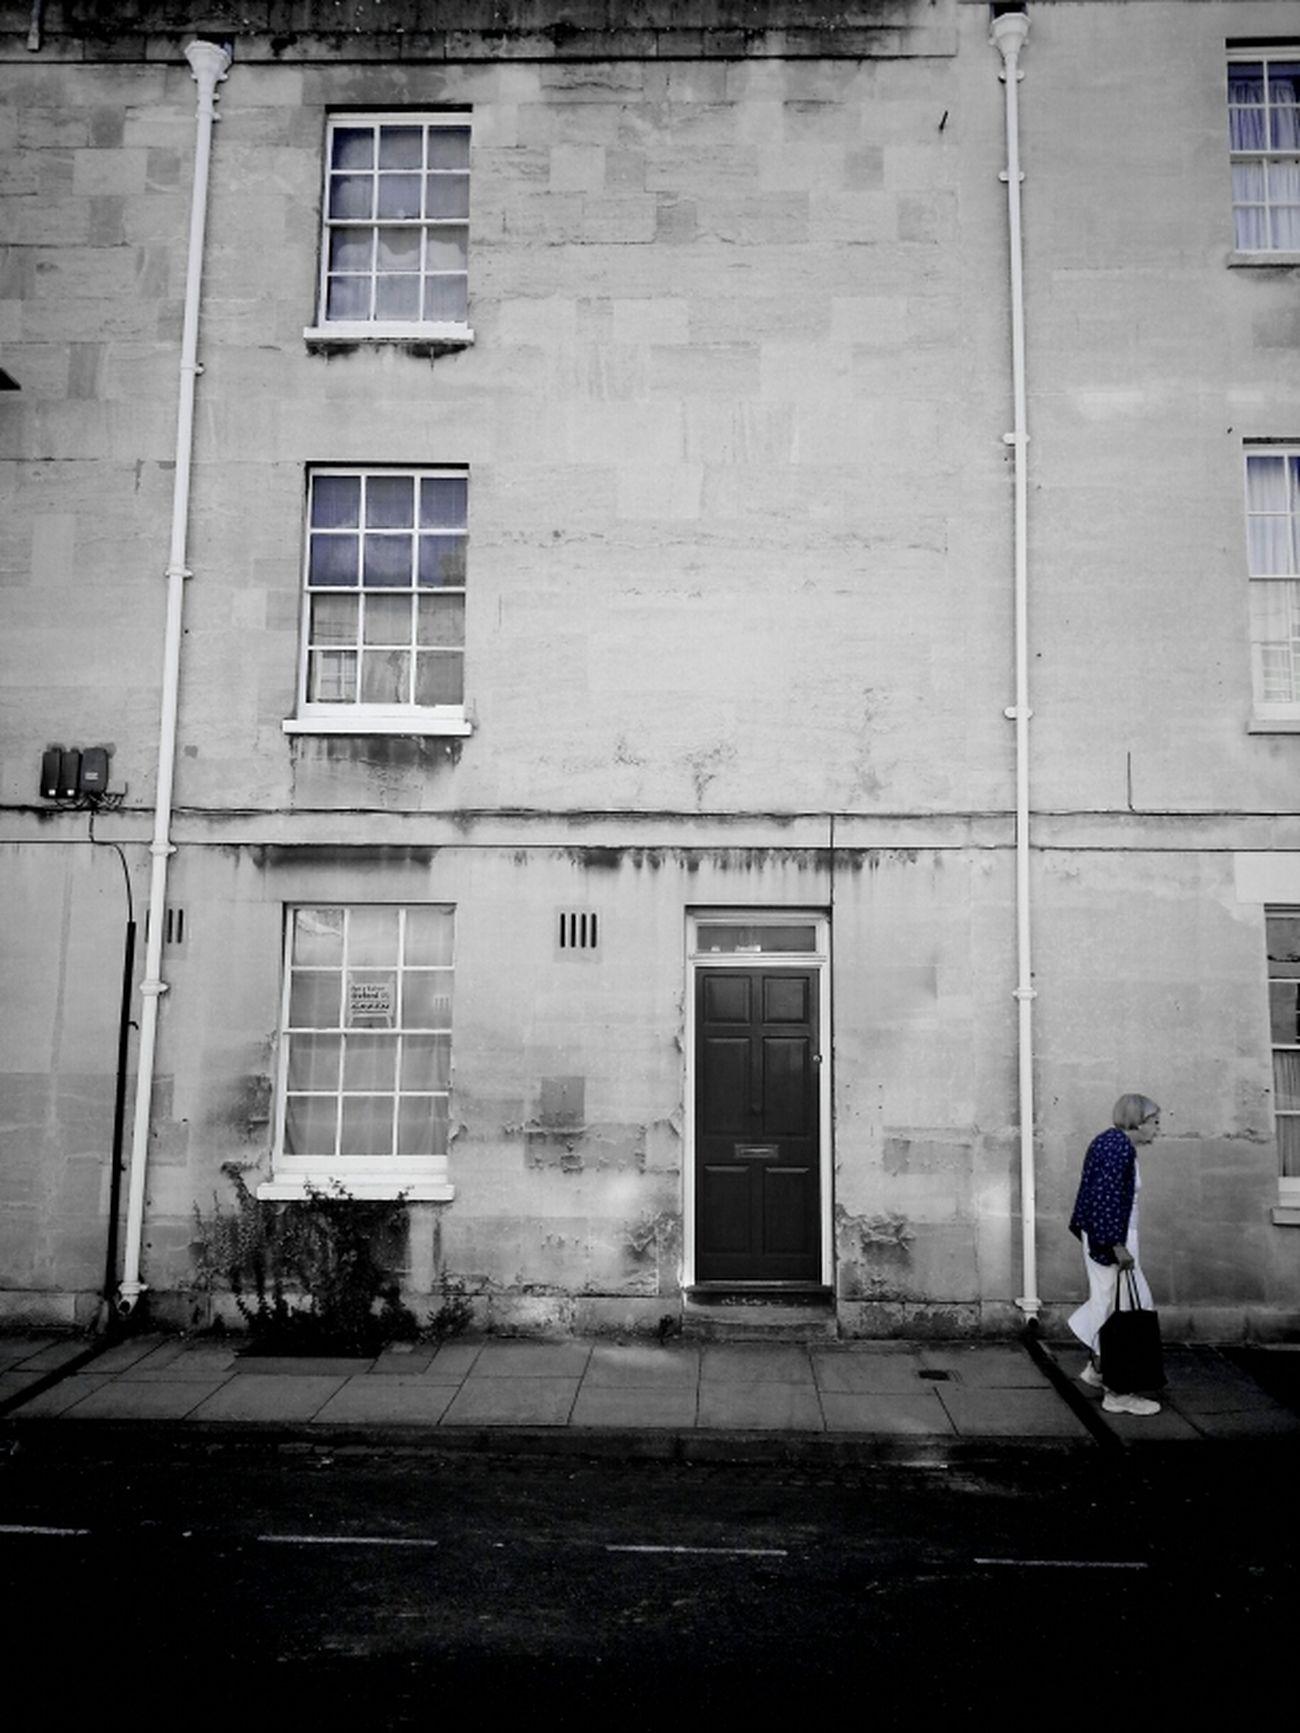 The Old Girl Shuffle Streetphotography Old Blue Girl WeAreJuxt.com TheMinimals (less Edit Juxt Photography) Android Oxford Andrographer Shuffle Street